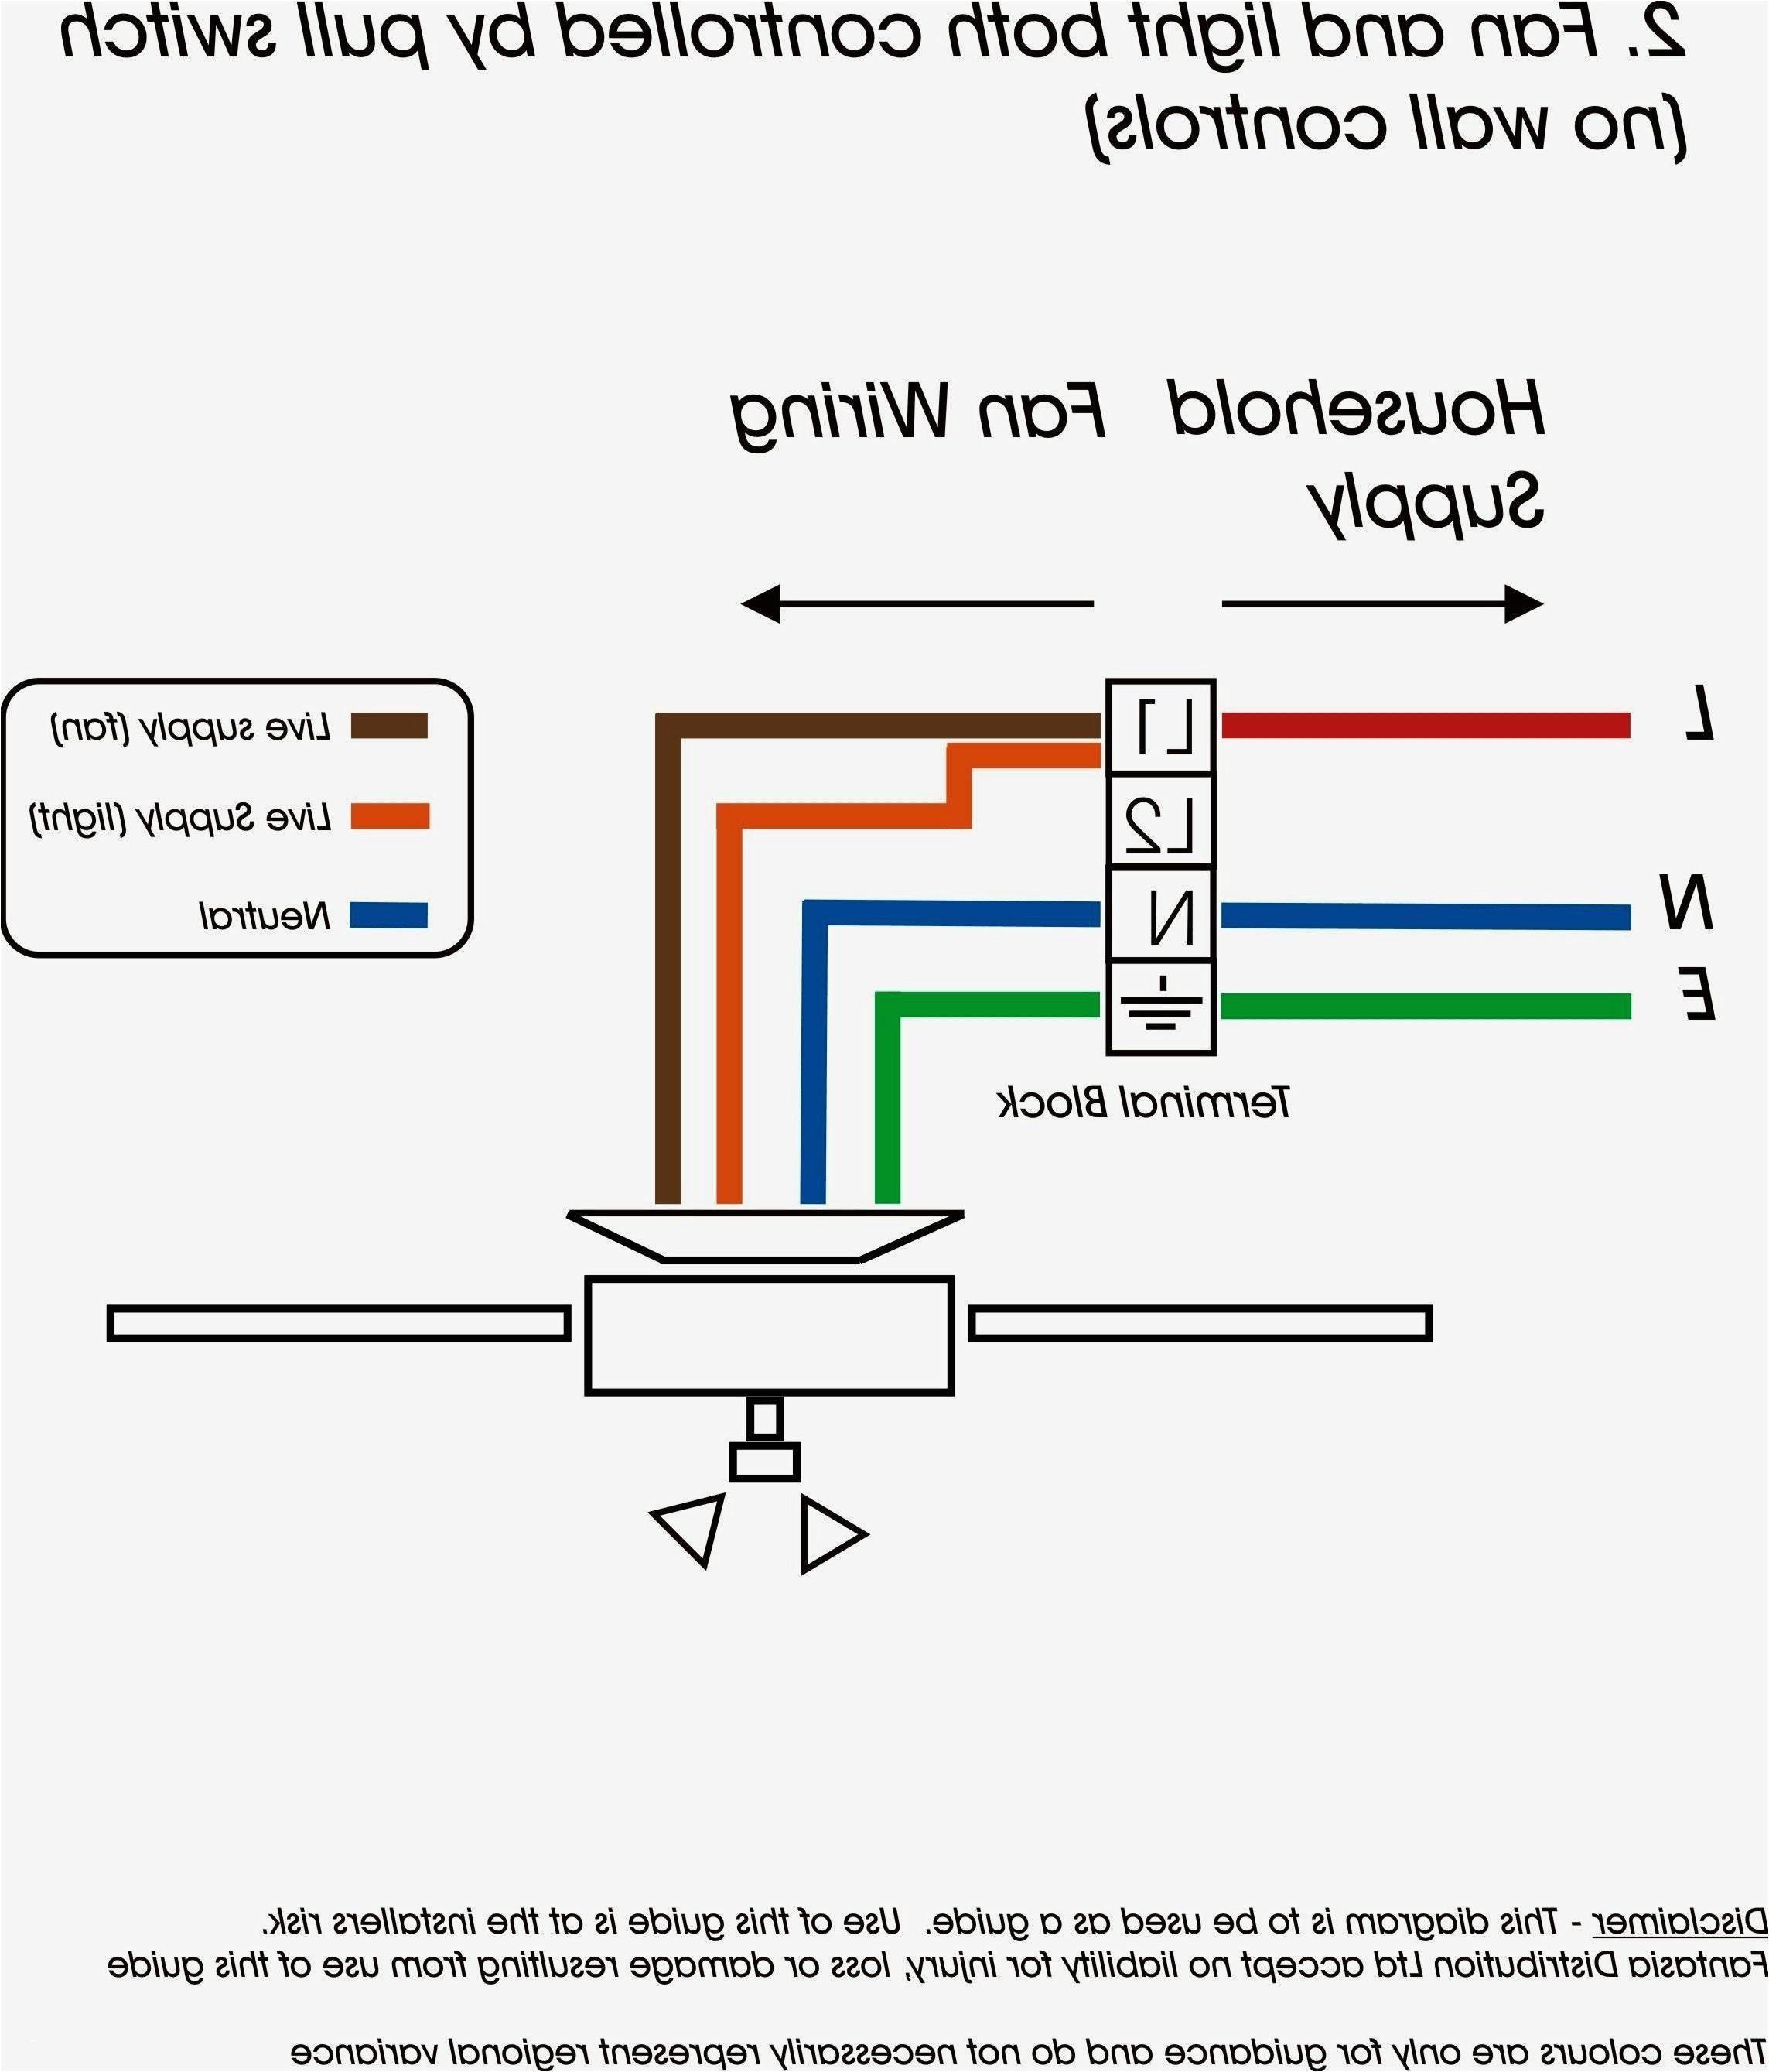 dc 3 wire diagram blog wiring diagram 3 wire dc motor diagram wiring diagram blog dc